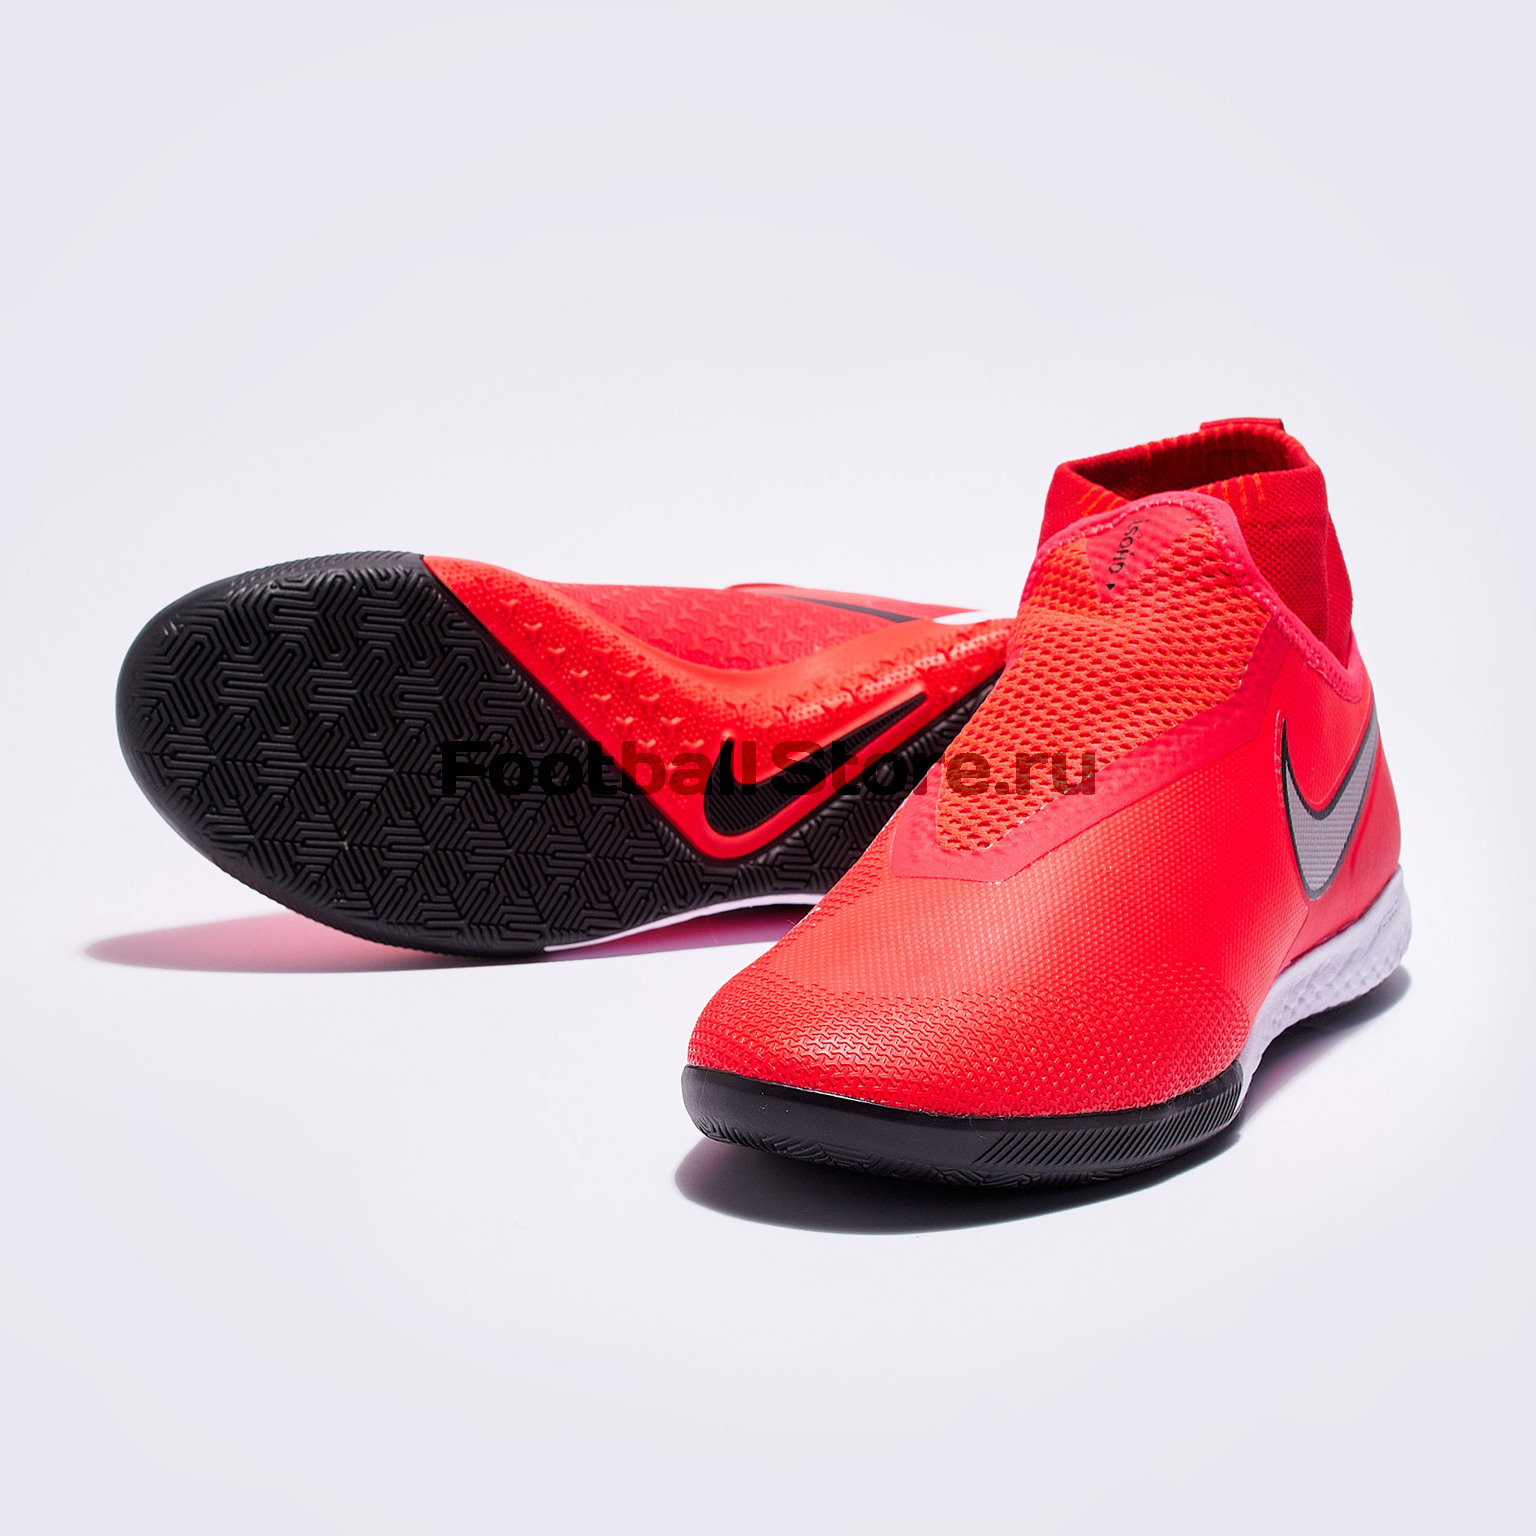 Футзалки Nike React Phantom Vision Pro DF IC AO3276-600 бутсы детские nike phantom vision academy df sg aq9298 400